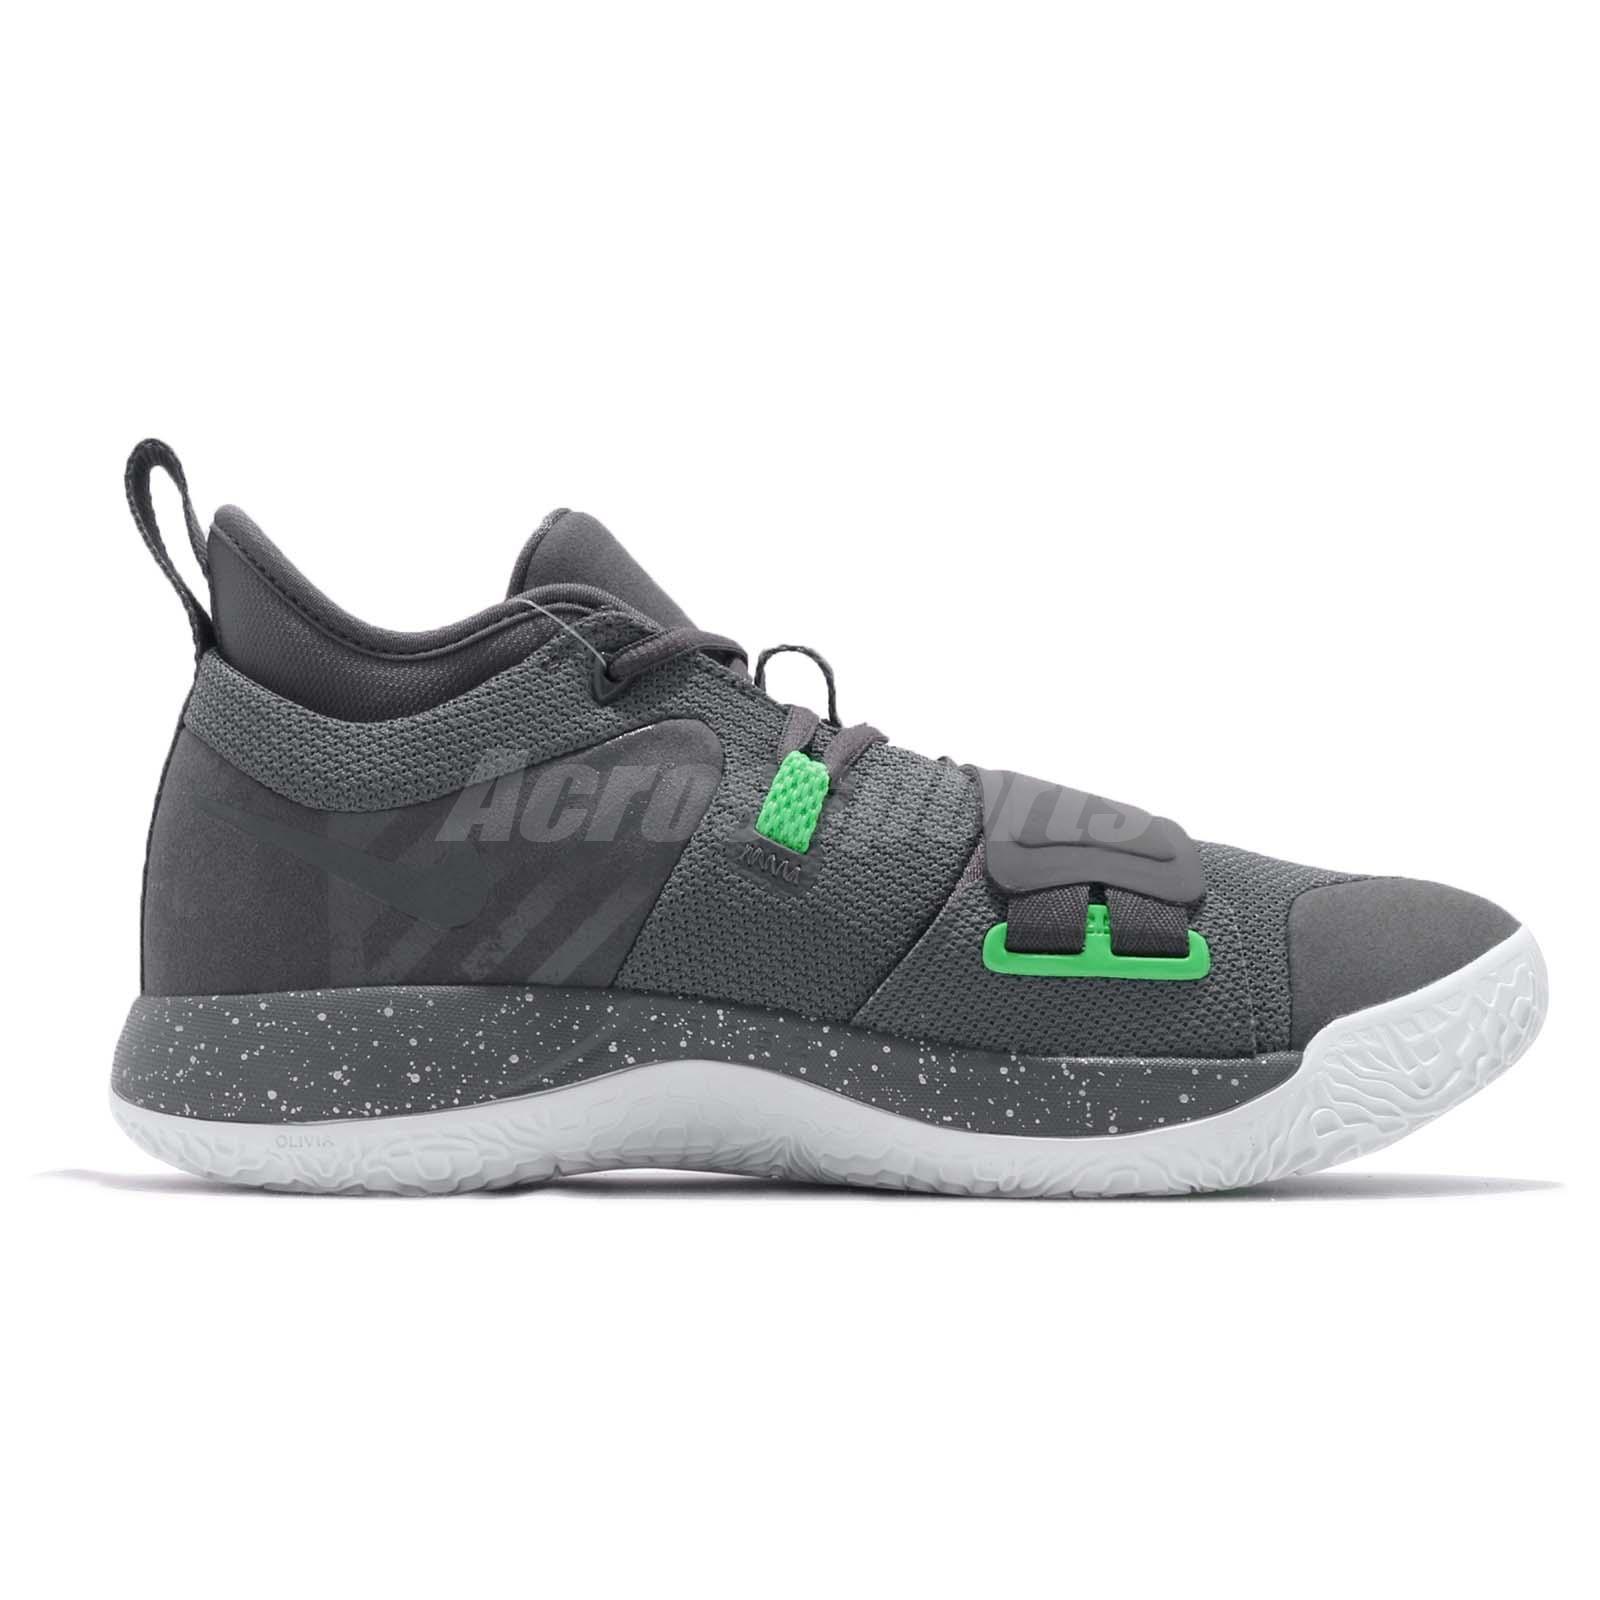 0cd003653c5c Nike PG 2.5 EP Paul George Grey Green White Men Basketball Shoes ...